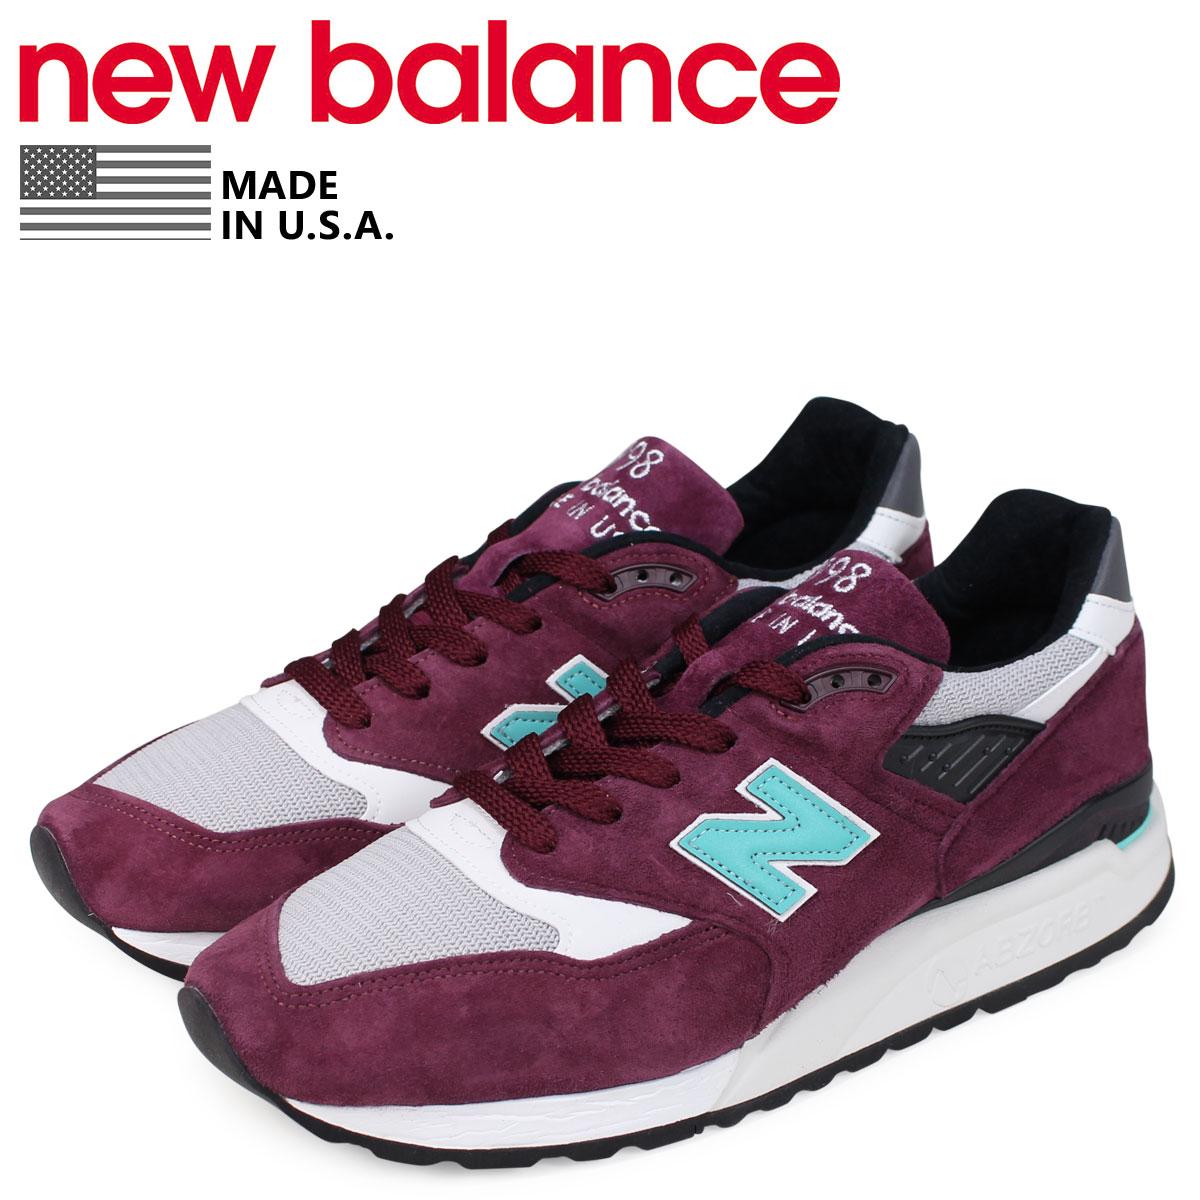 new balance 998 burgundy